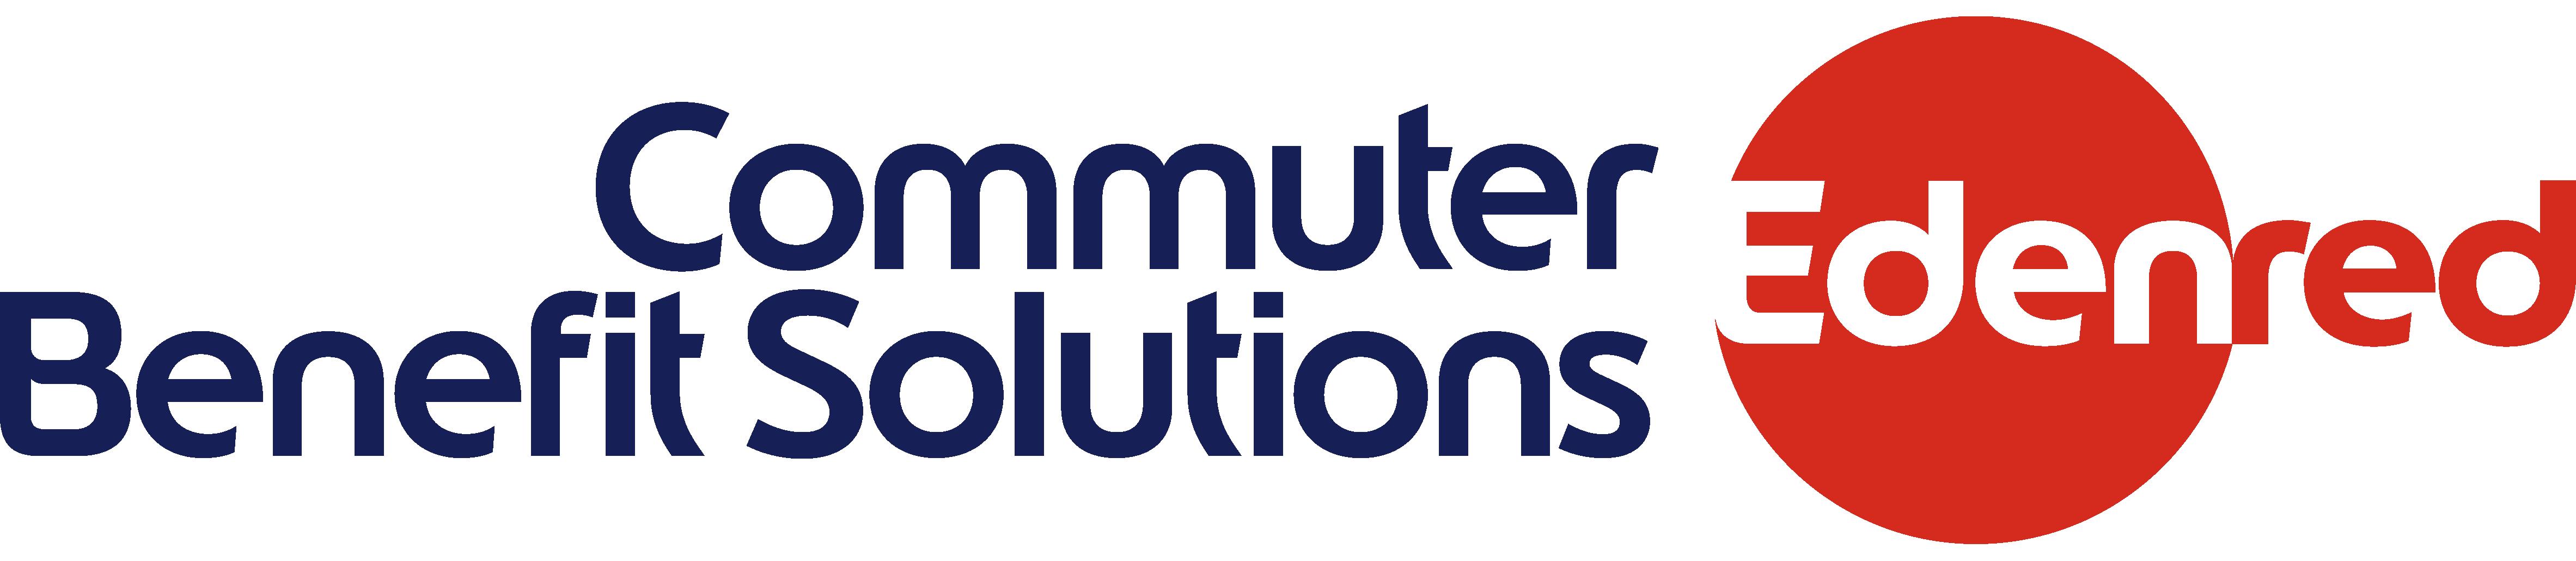 Commuter Benefit Solutions Edenred